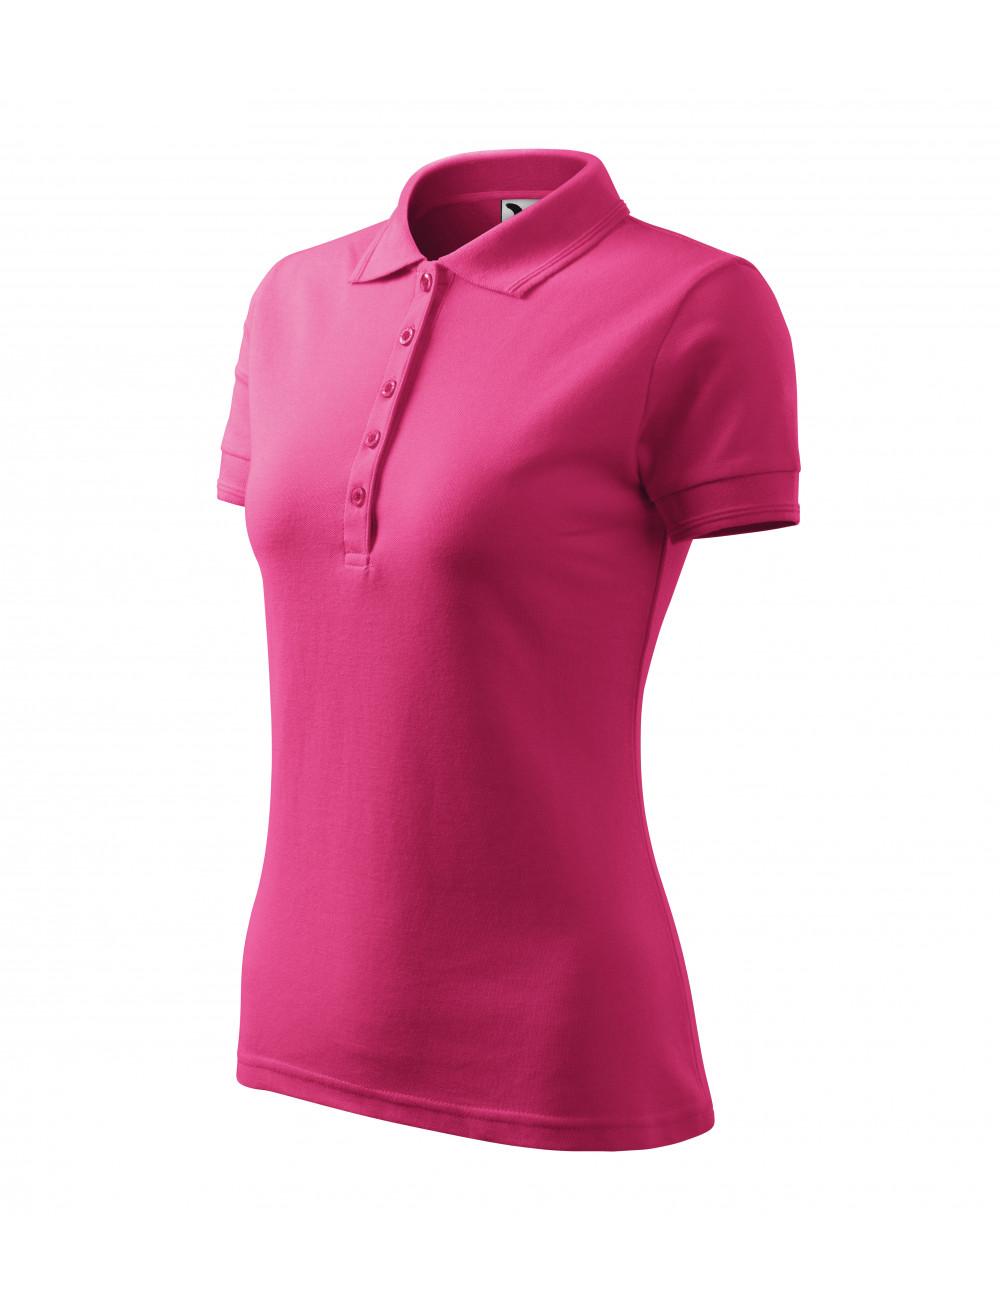 Adler MALFINI Koszulka polo damska Pique Polo 210 czerwień purpurowa